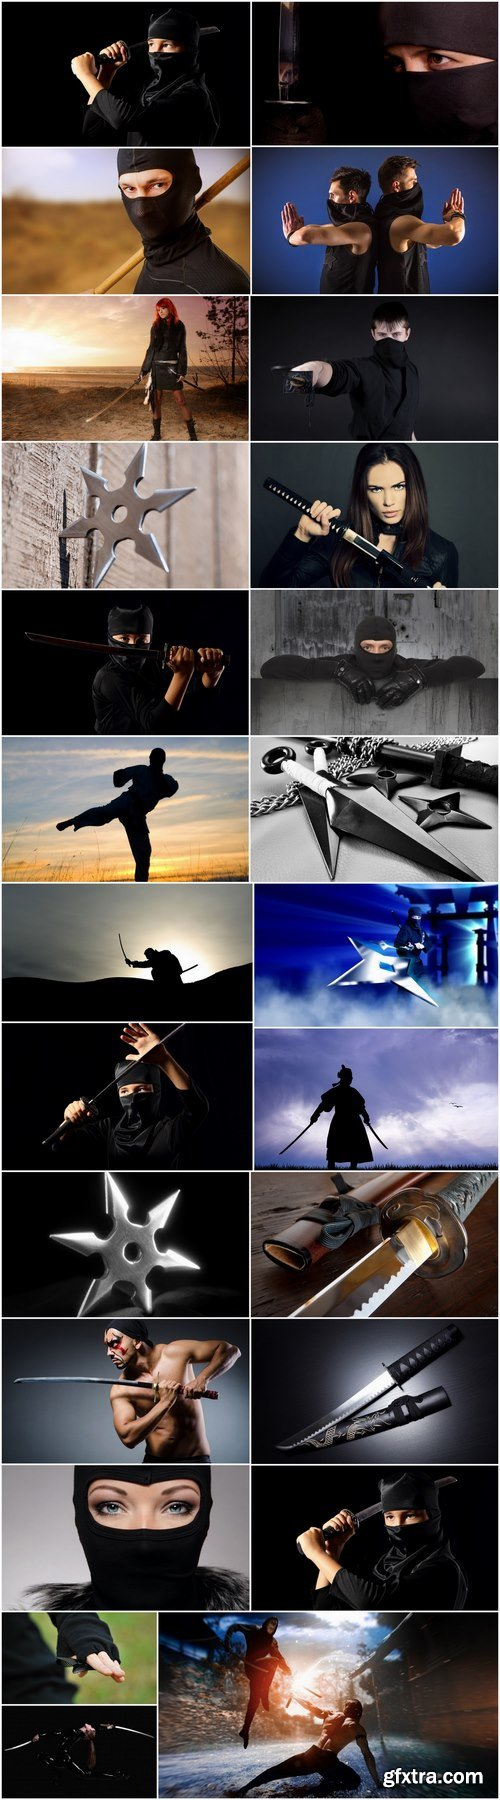 Ninja shuriken warrior katana sword 25 HQ Jpeg